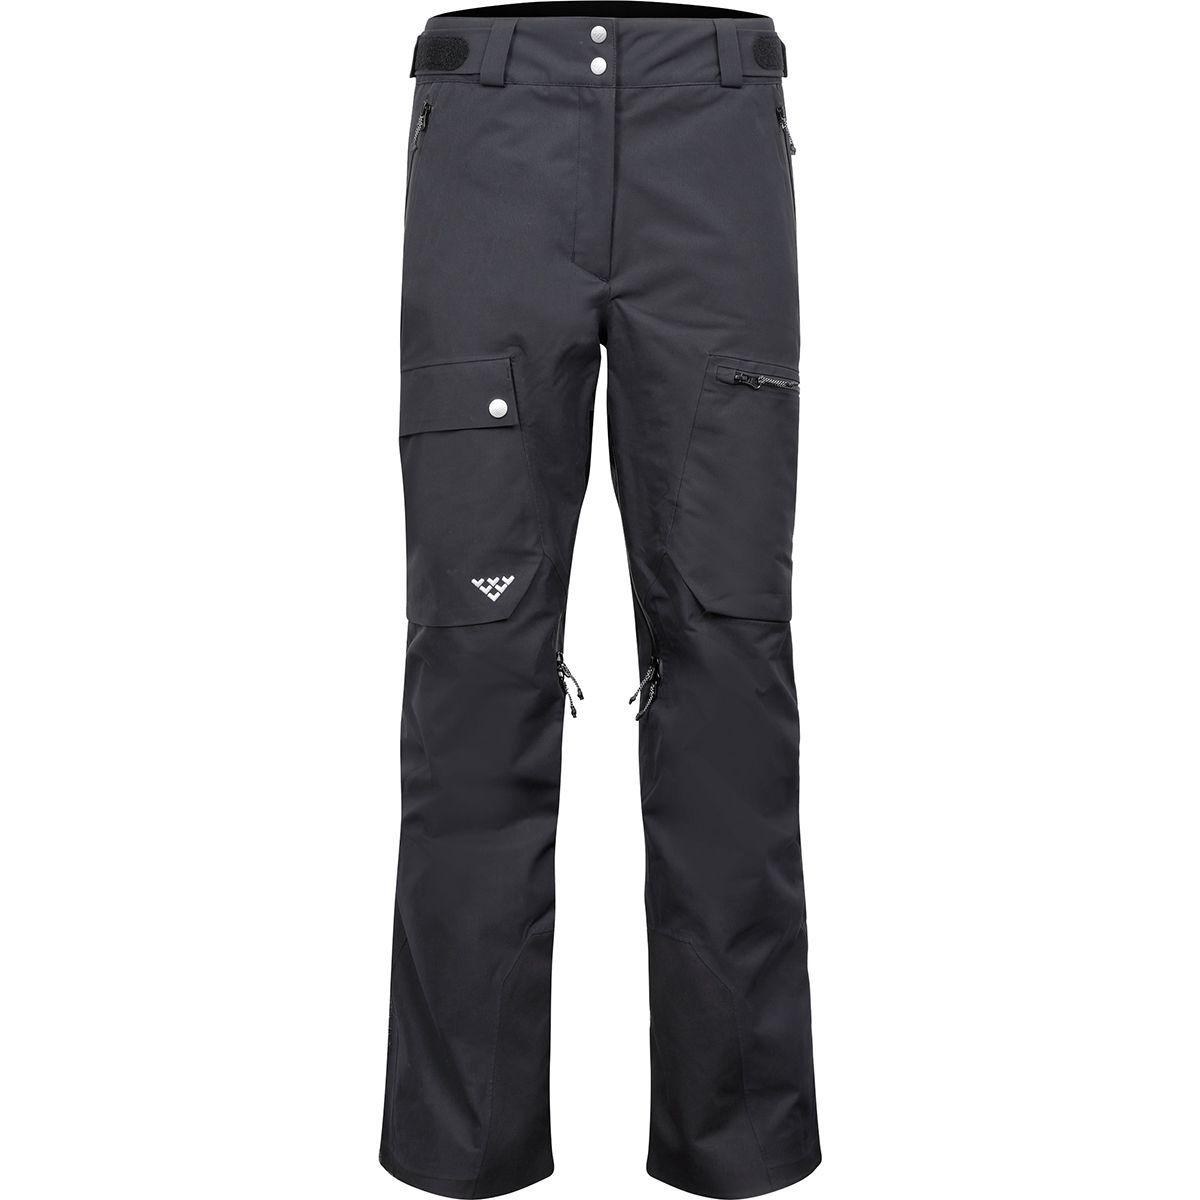 Black Crows Corpus Insulated Gore-Tex Pant - Men's